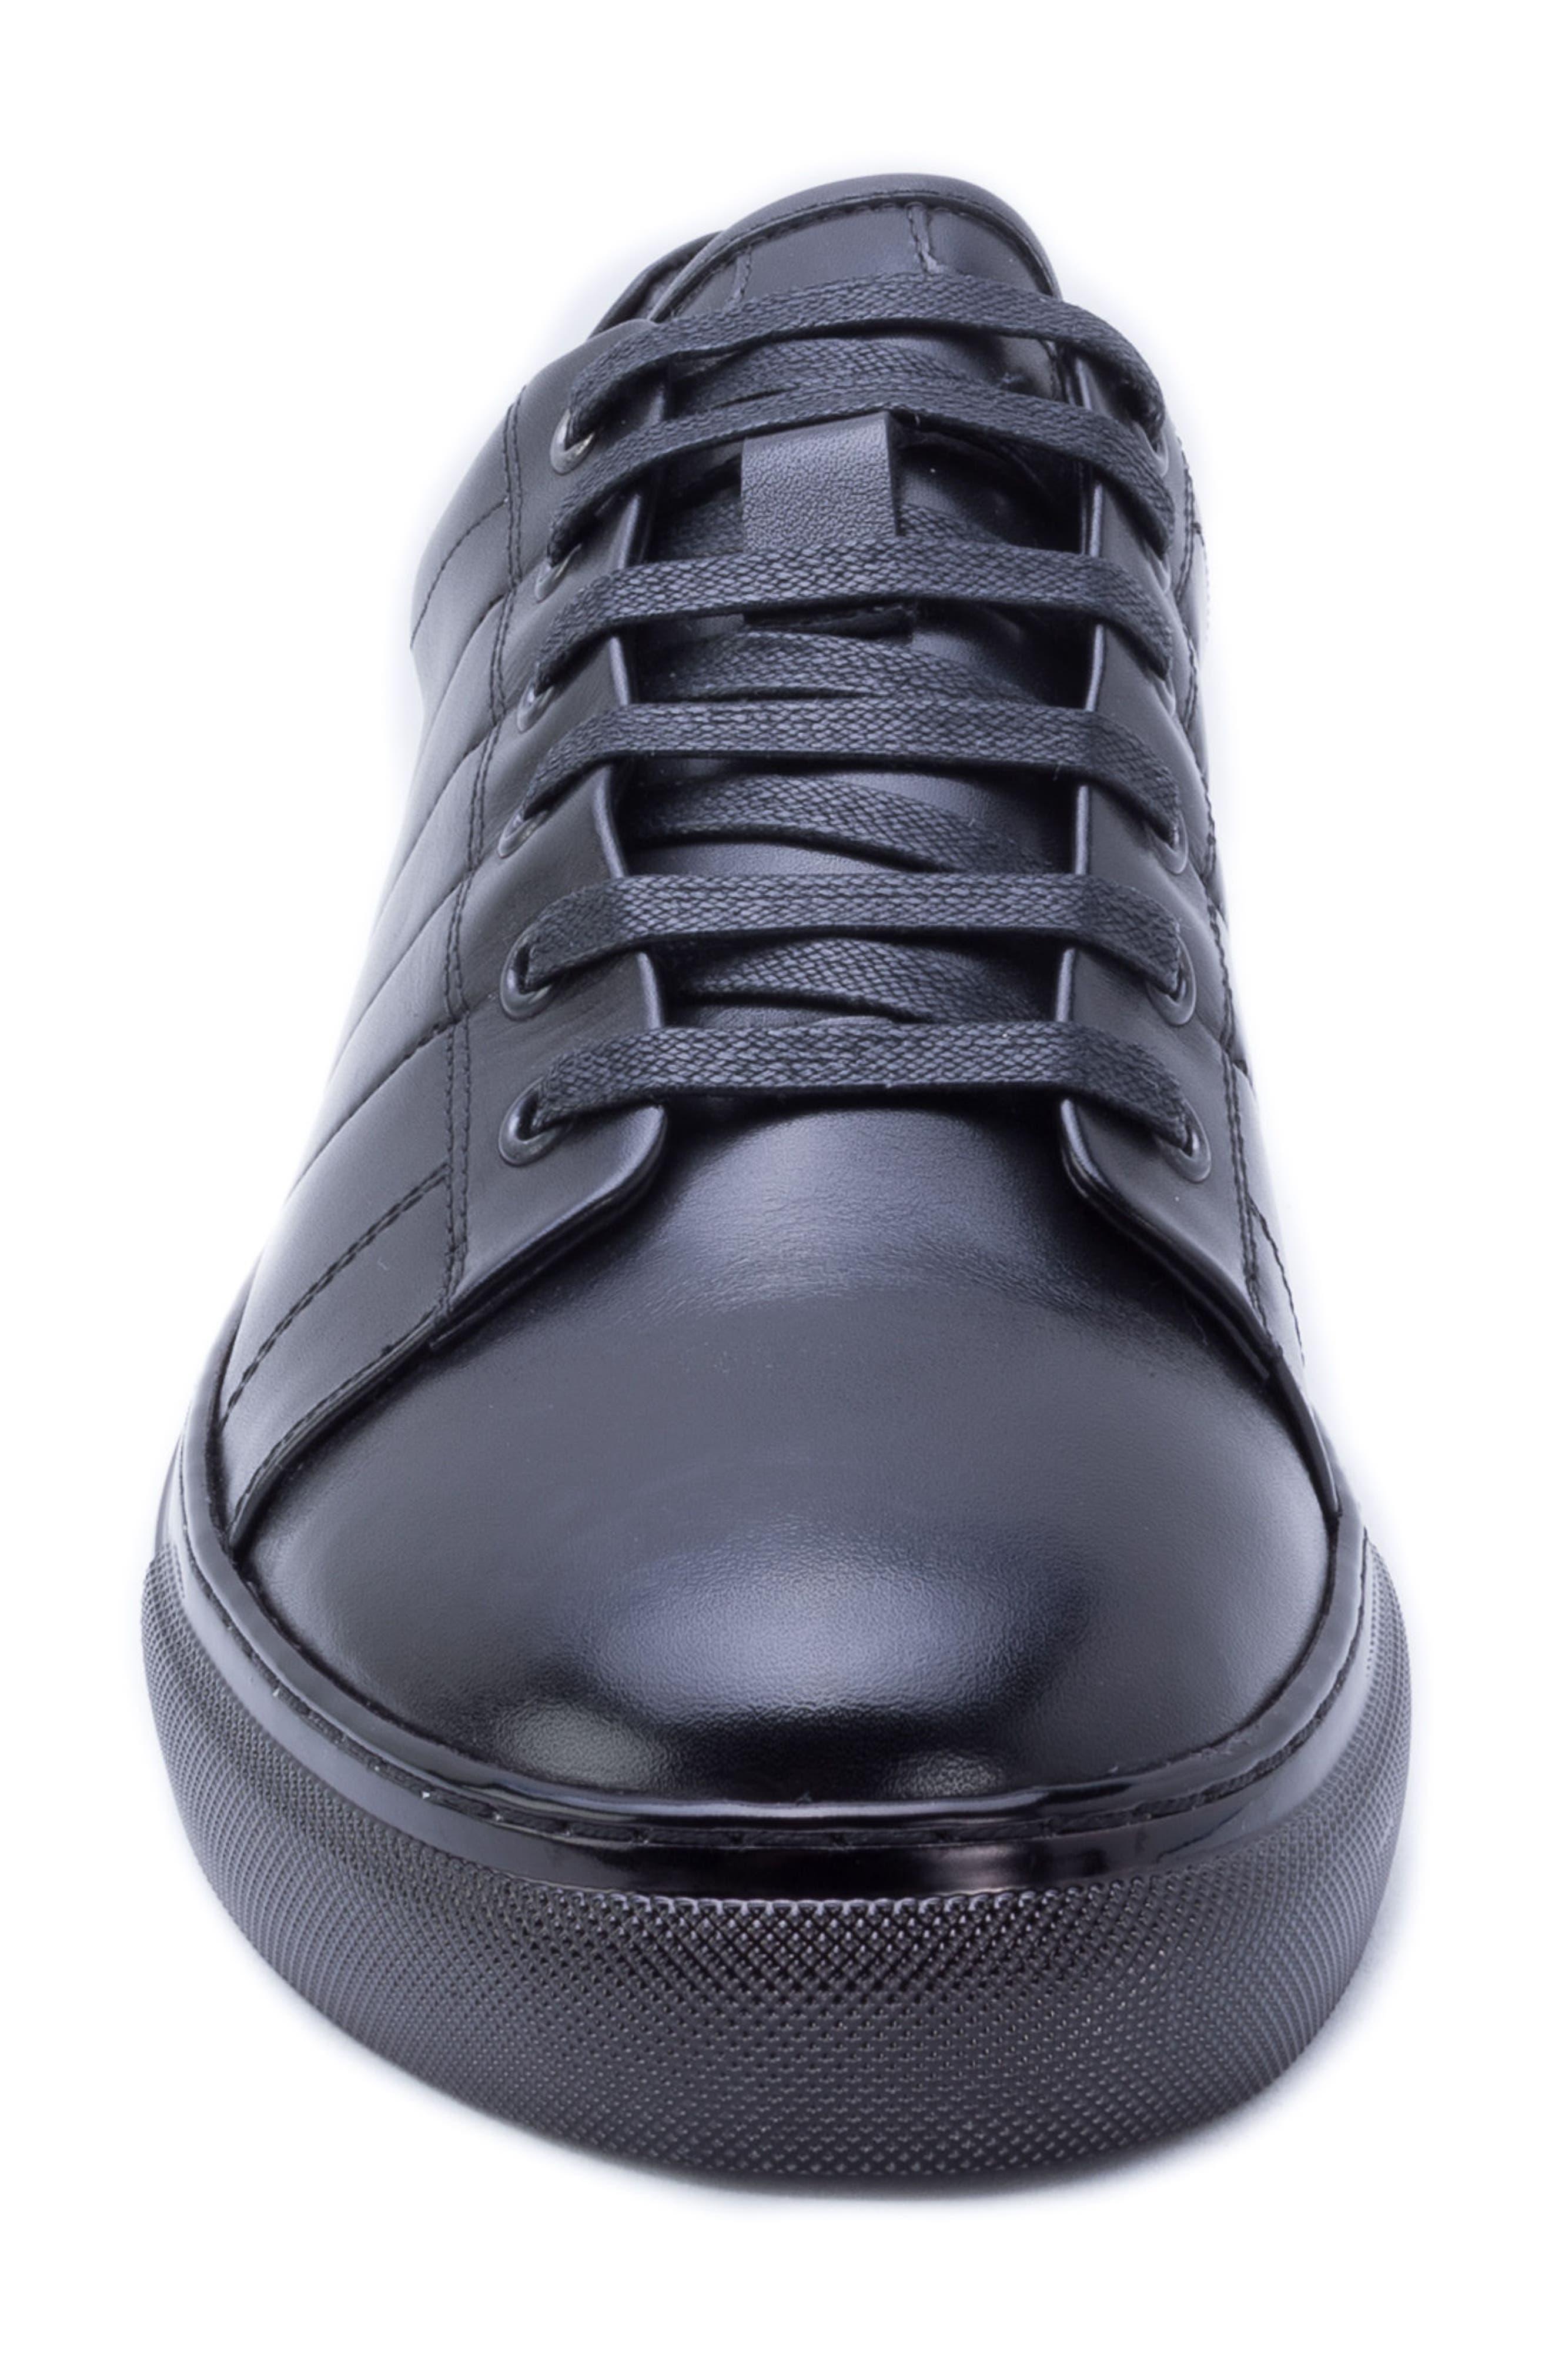 Hackman Sneaker,                             Alternate thumbnail 4, color,                             BLACK LEATHER